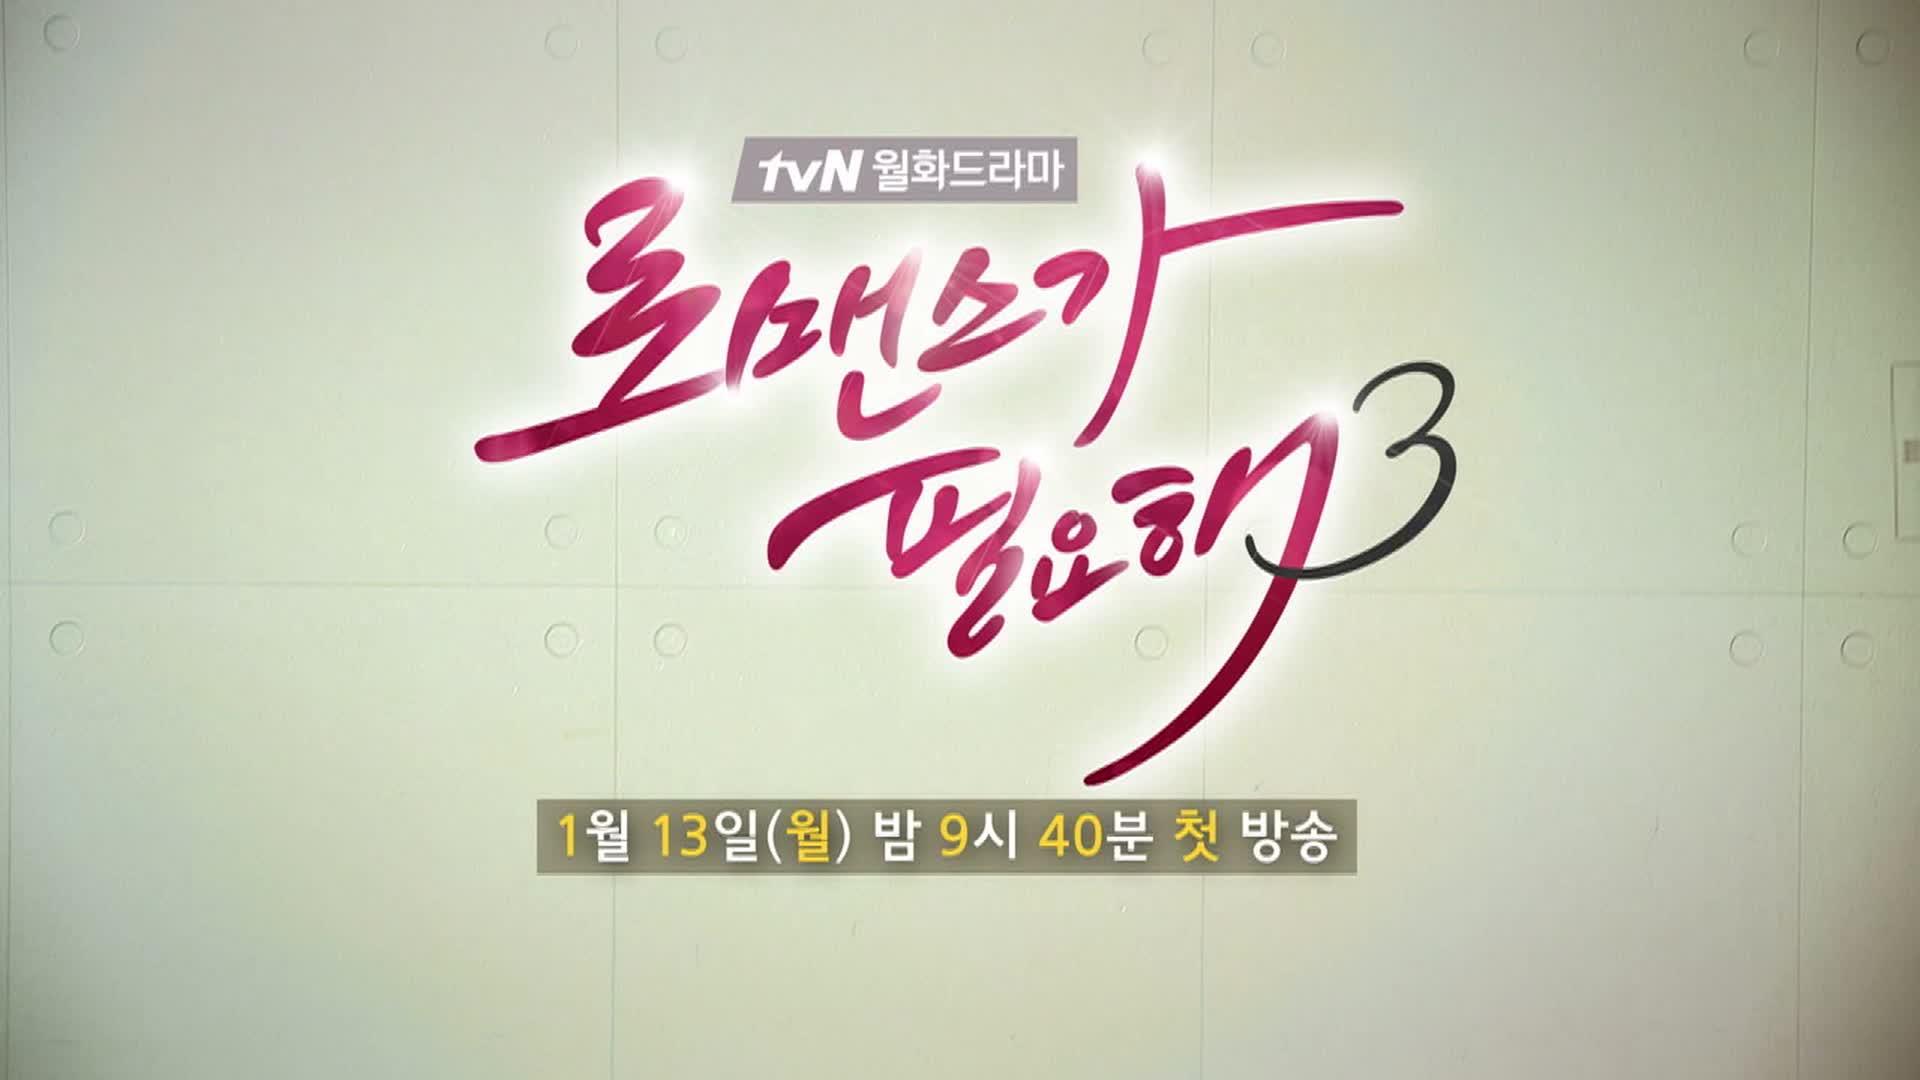 I Need Romance 3 Teaser4: I Need Romance 3